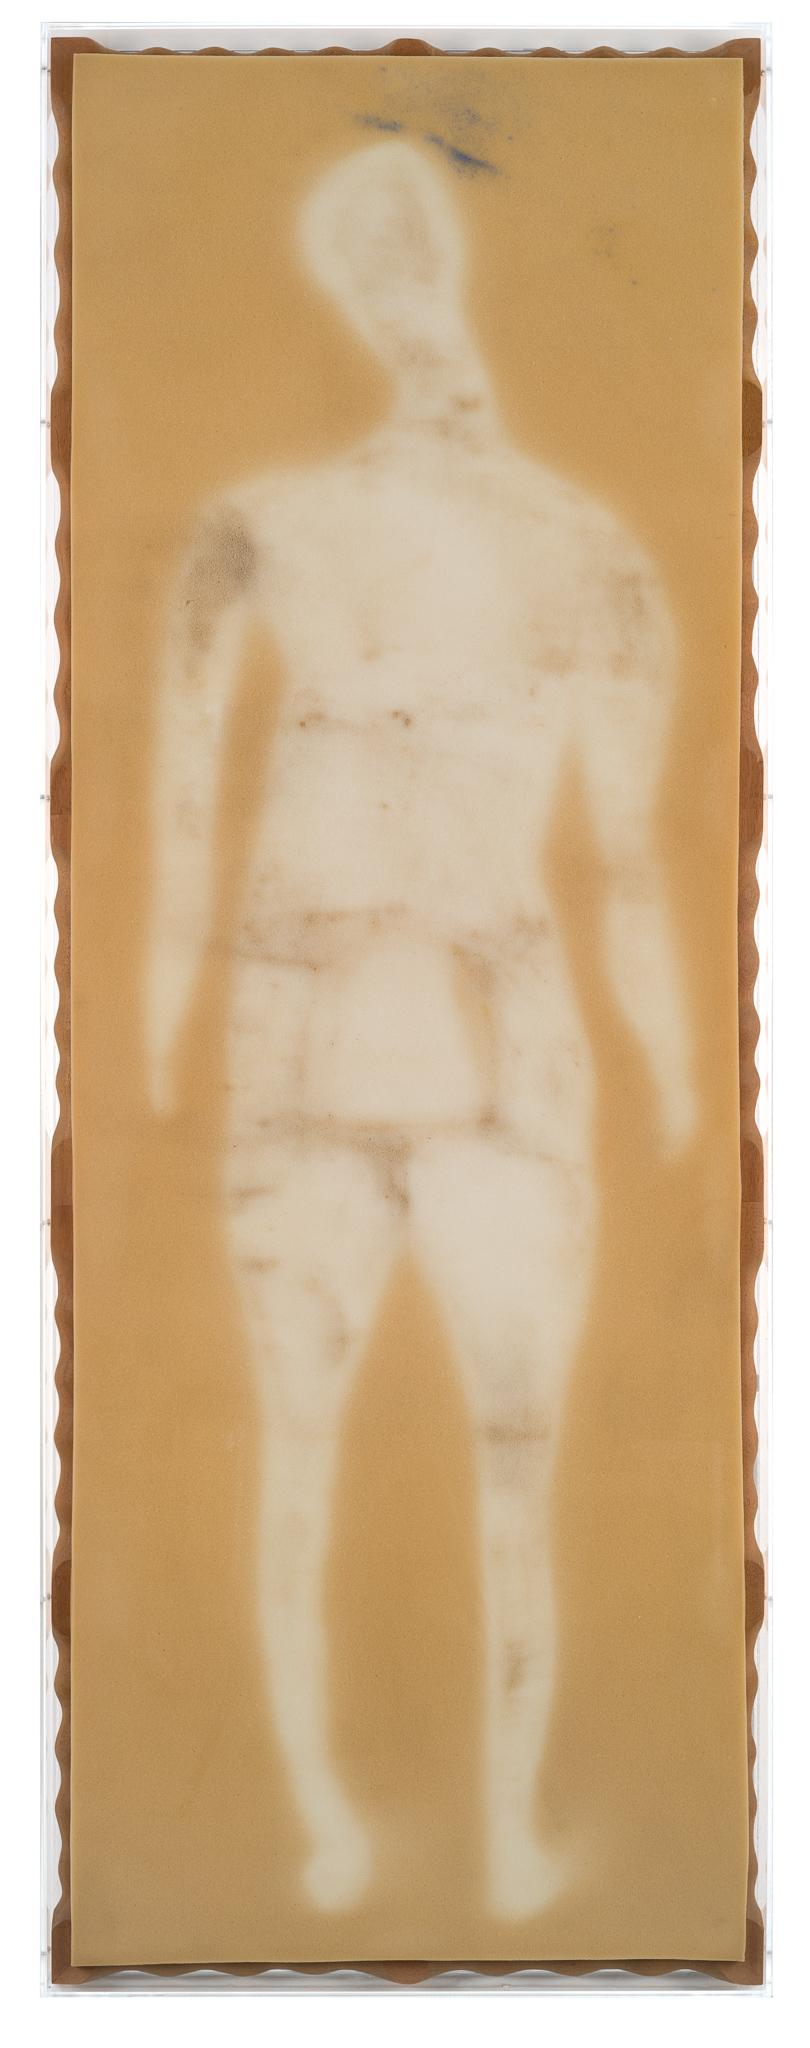 Development, 2015/18, Sponge foam, mahogany, acrylic glass, 192,5 x 71,5 x 7,5 cm